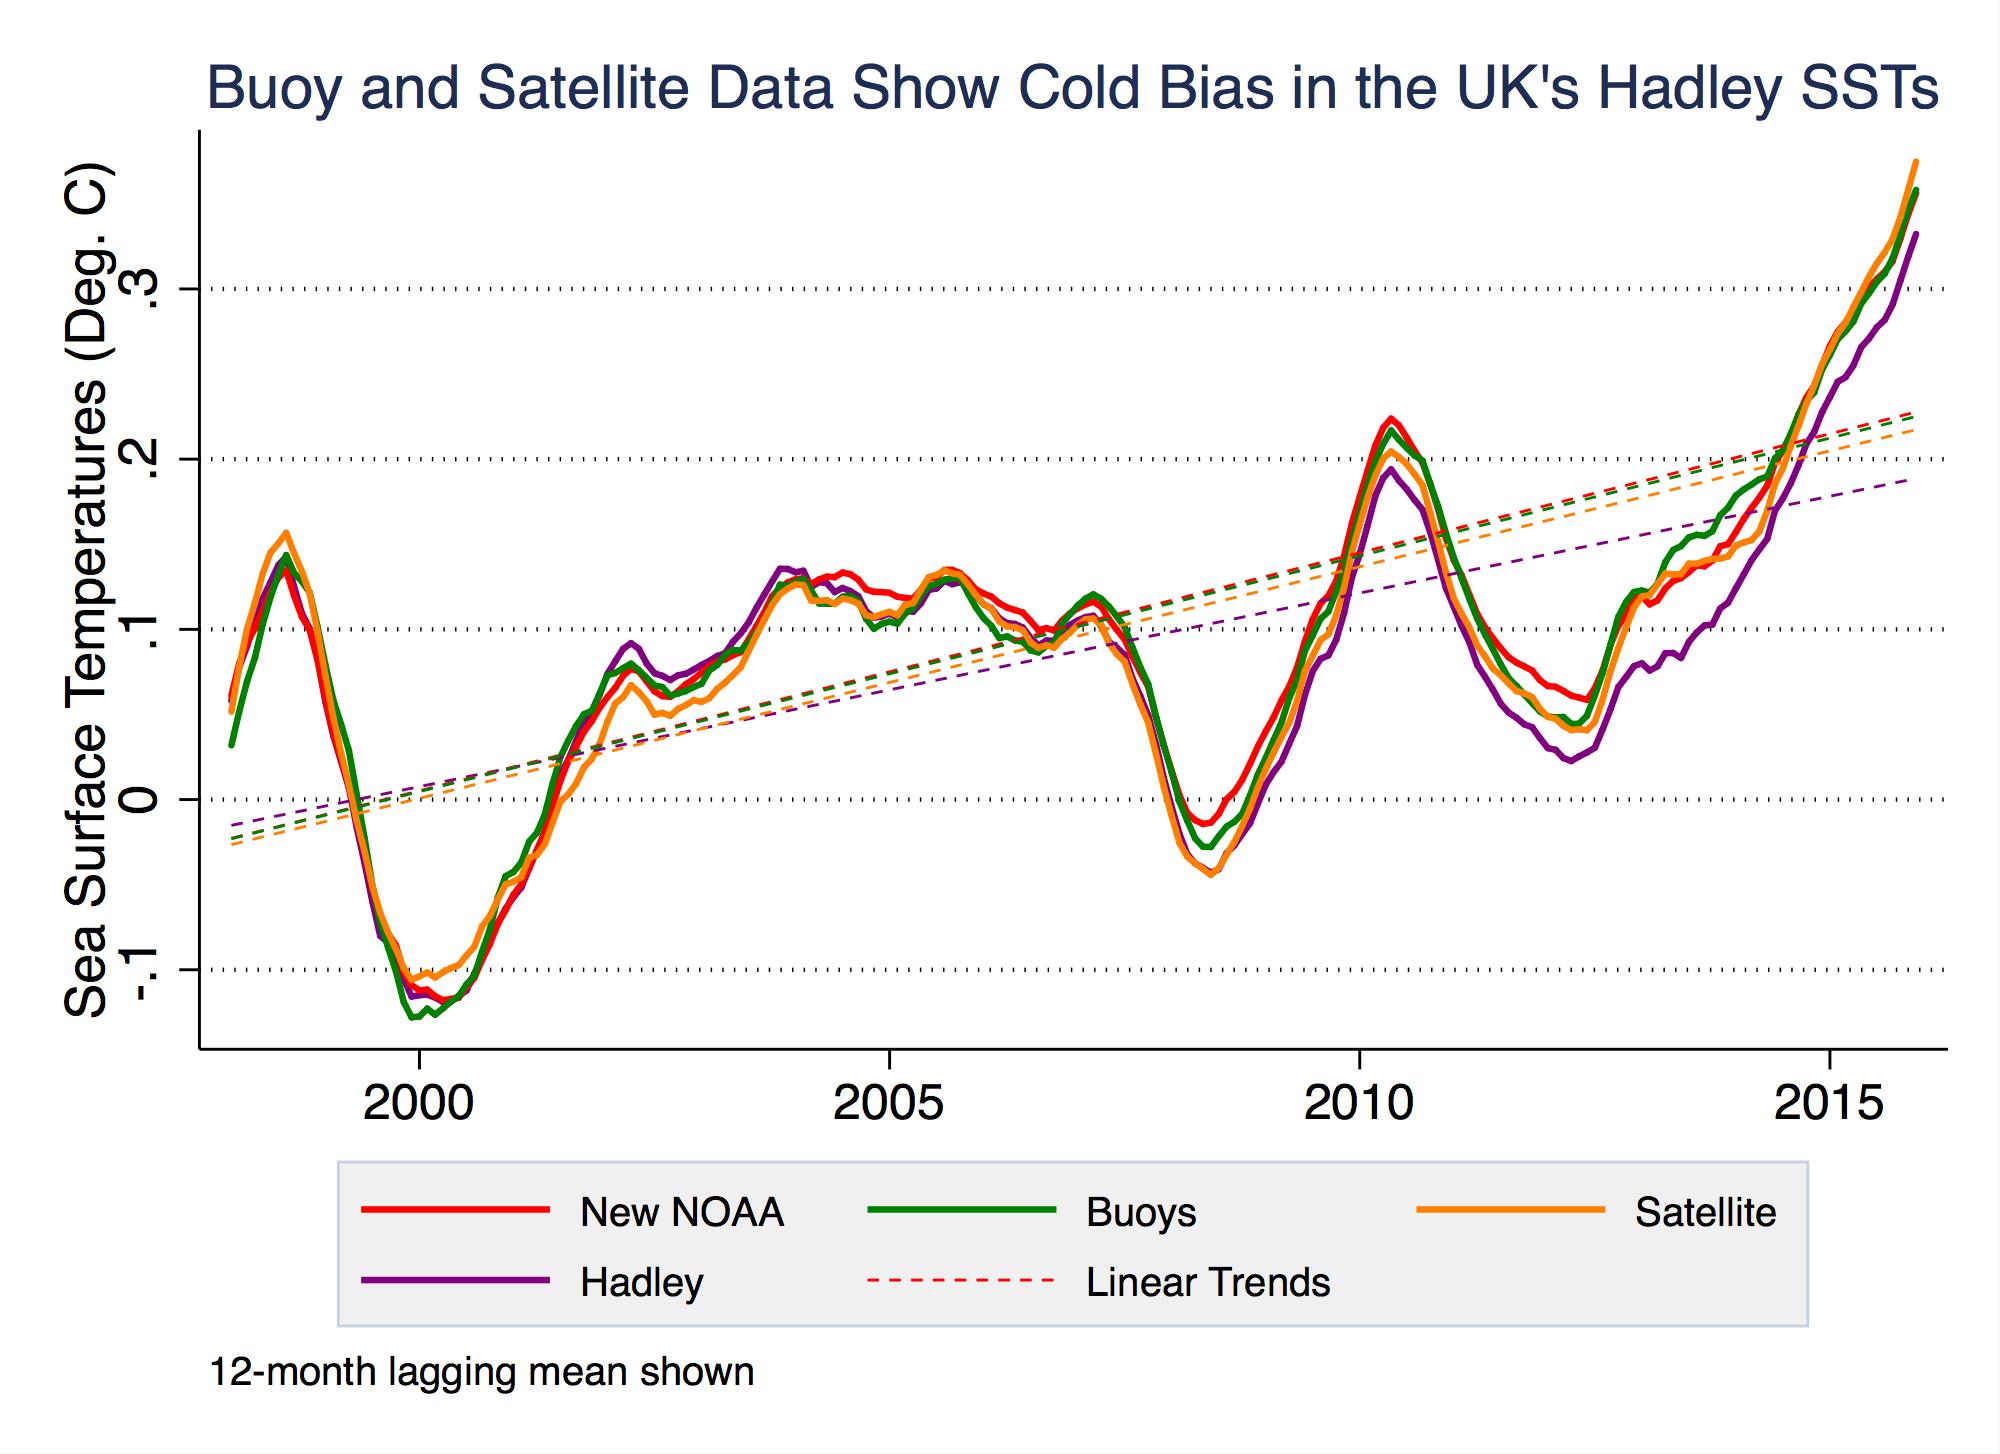 Comparison of Berkeley and Hadley Data